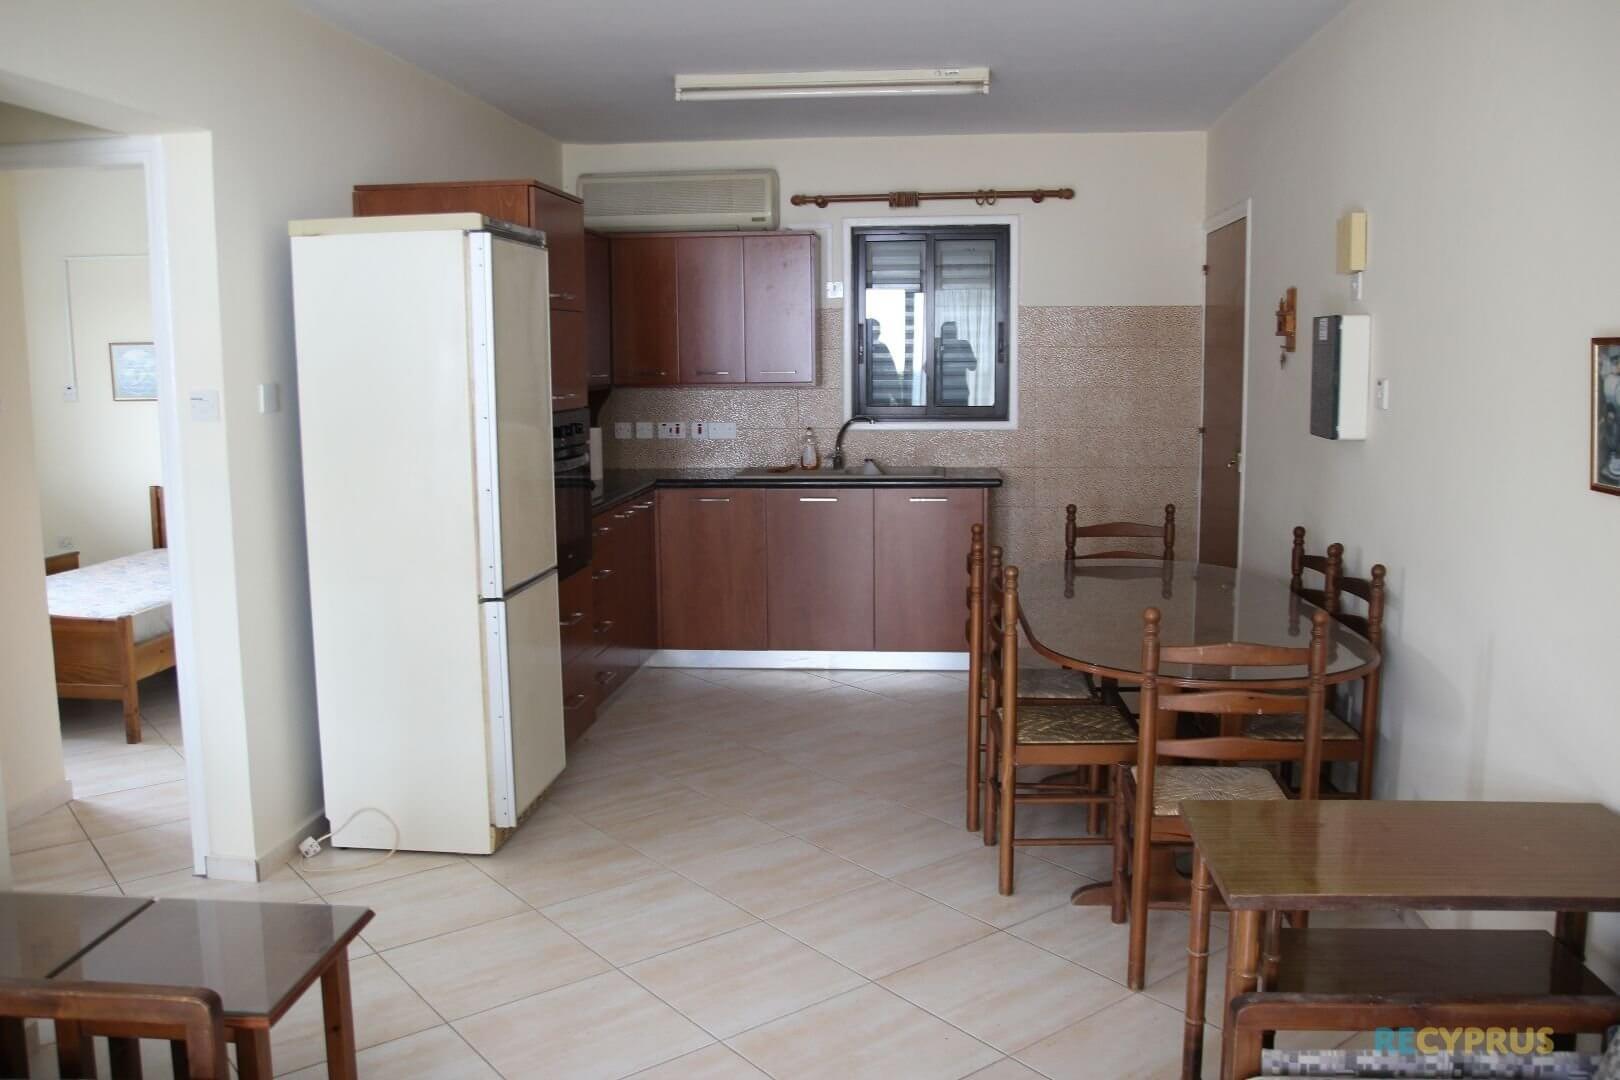 Apartment for sale Kapparis Famagusta Cyprus 1 3559